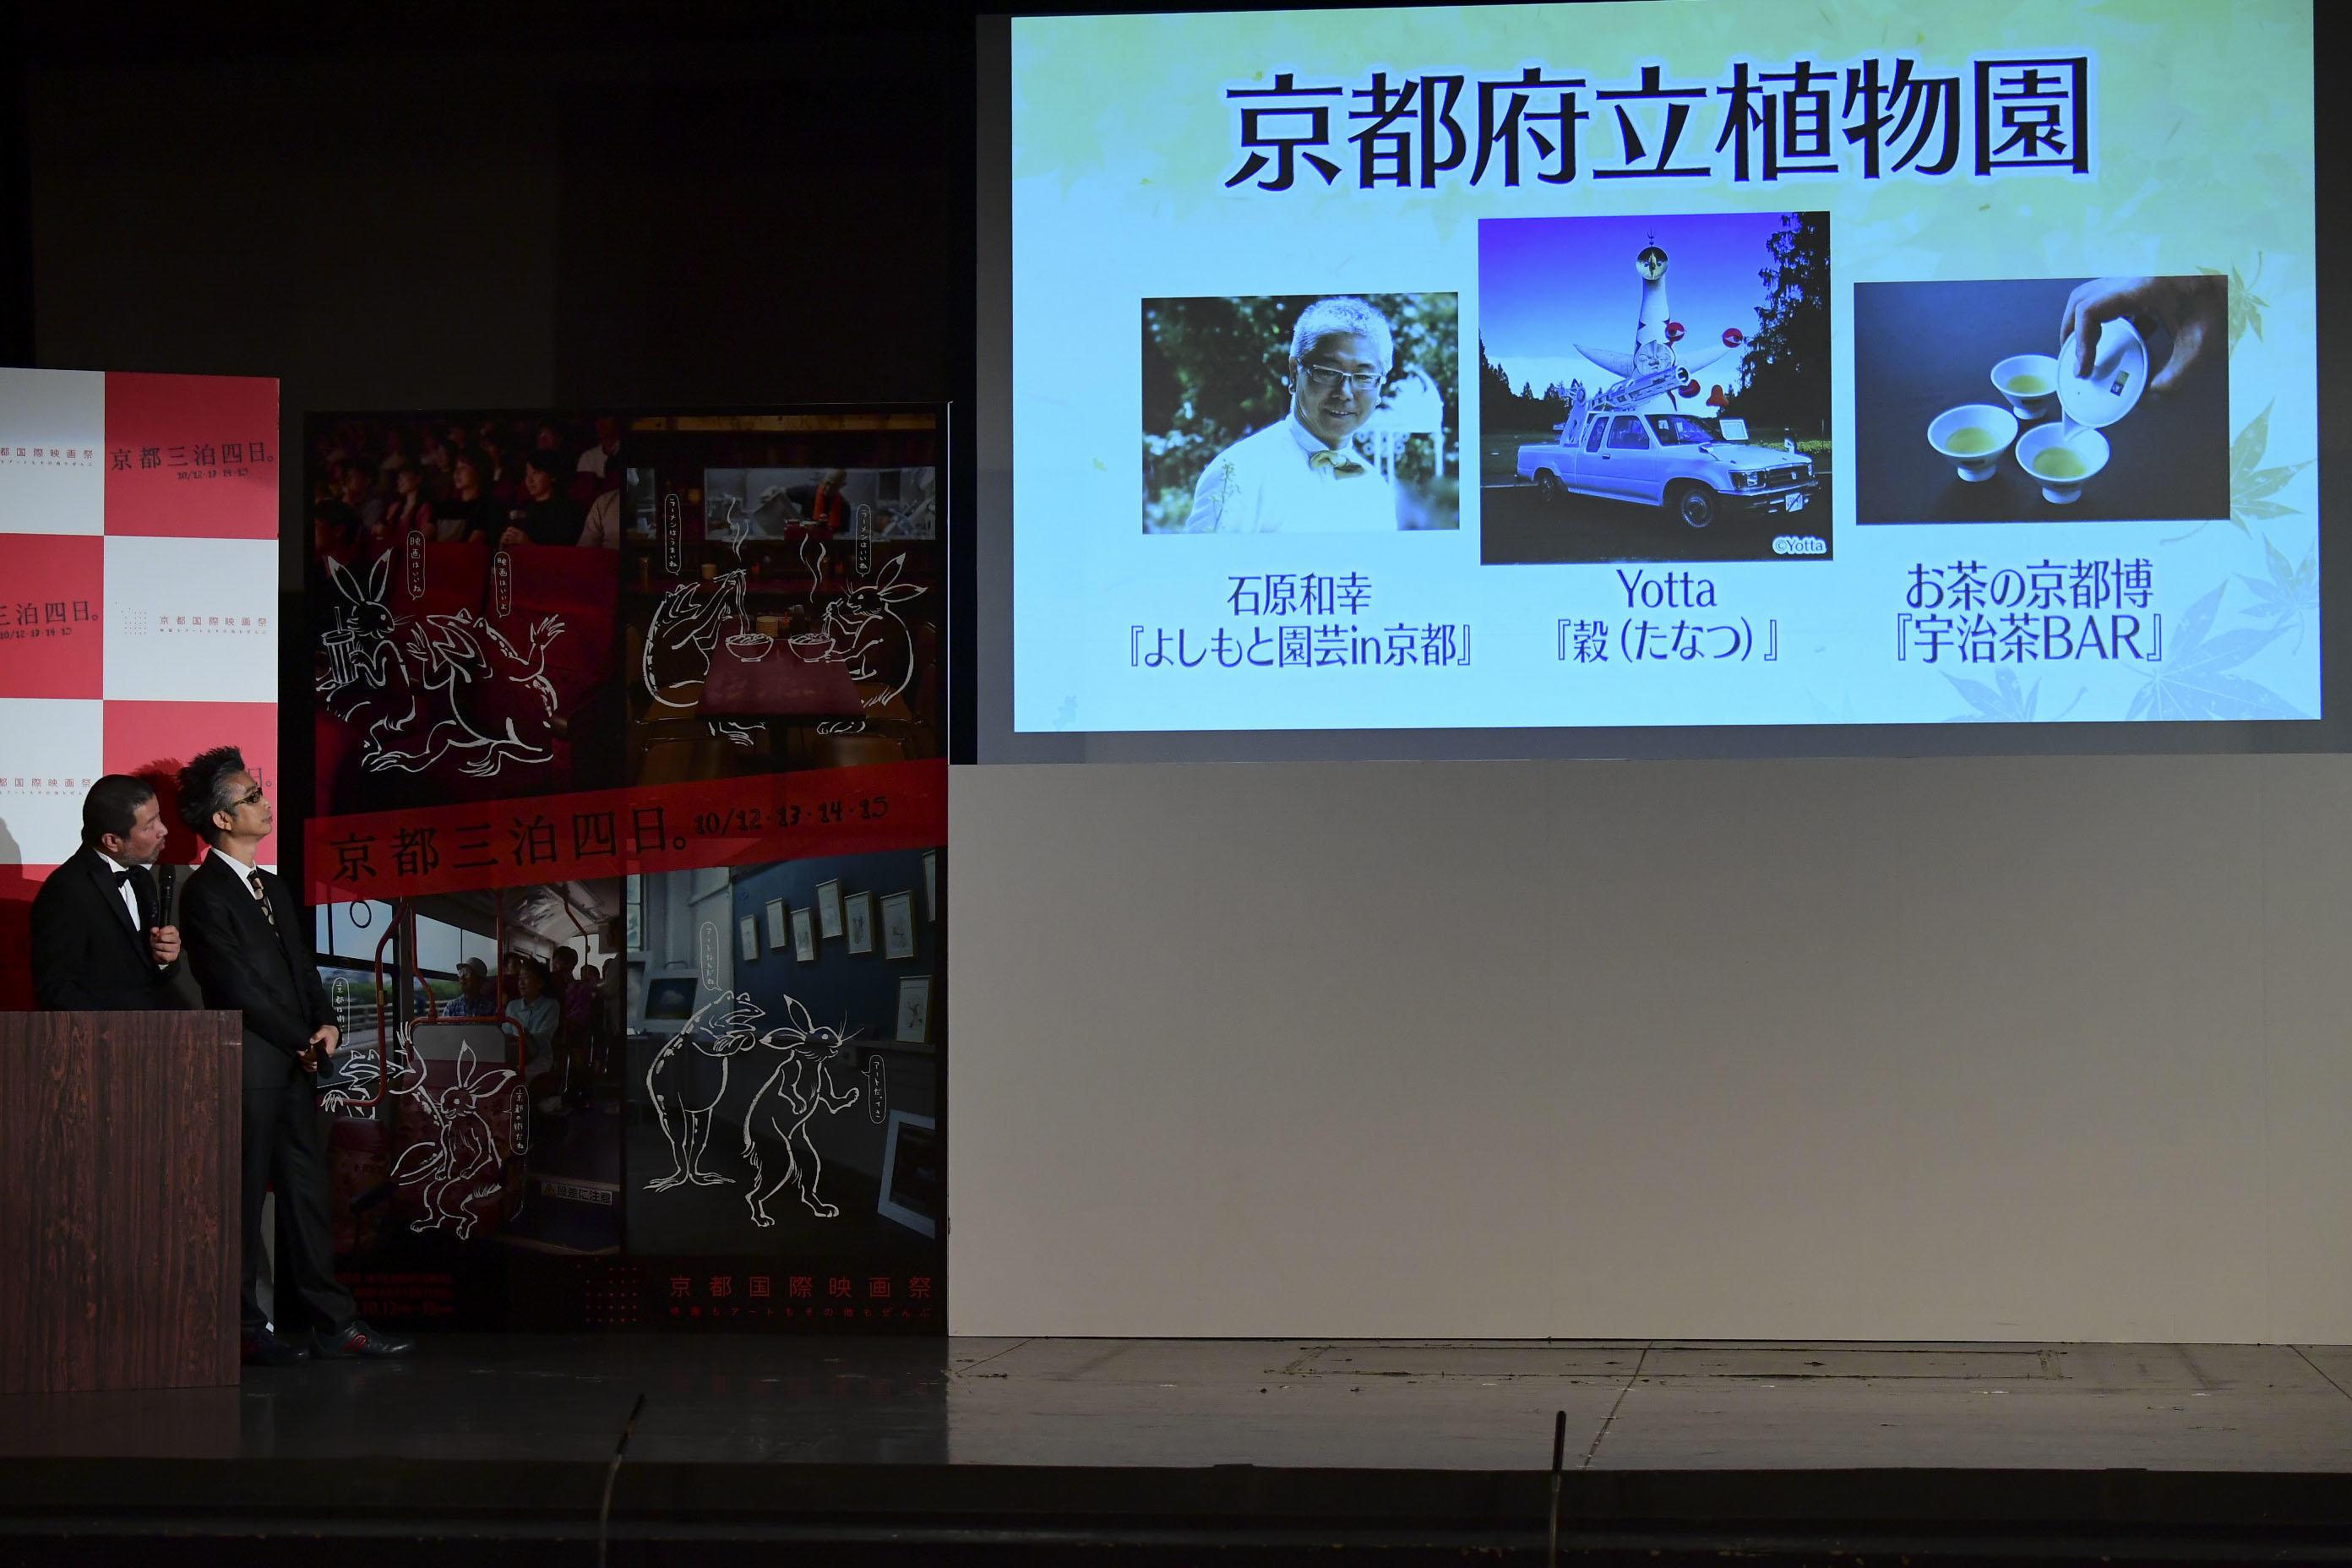 http://news.yoshimoto.co.jp/20170907021746-3e1a9d205eba5a3541b140b6e94e18a8d0081ad4.jpg